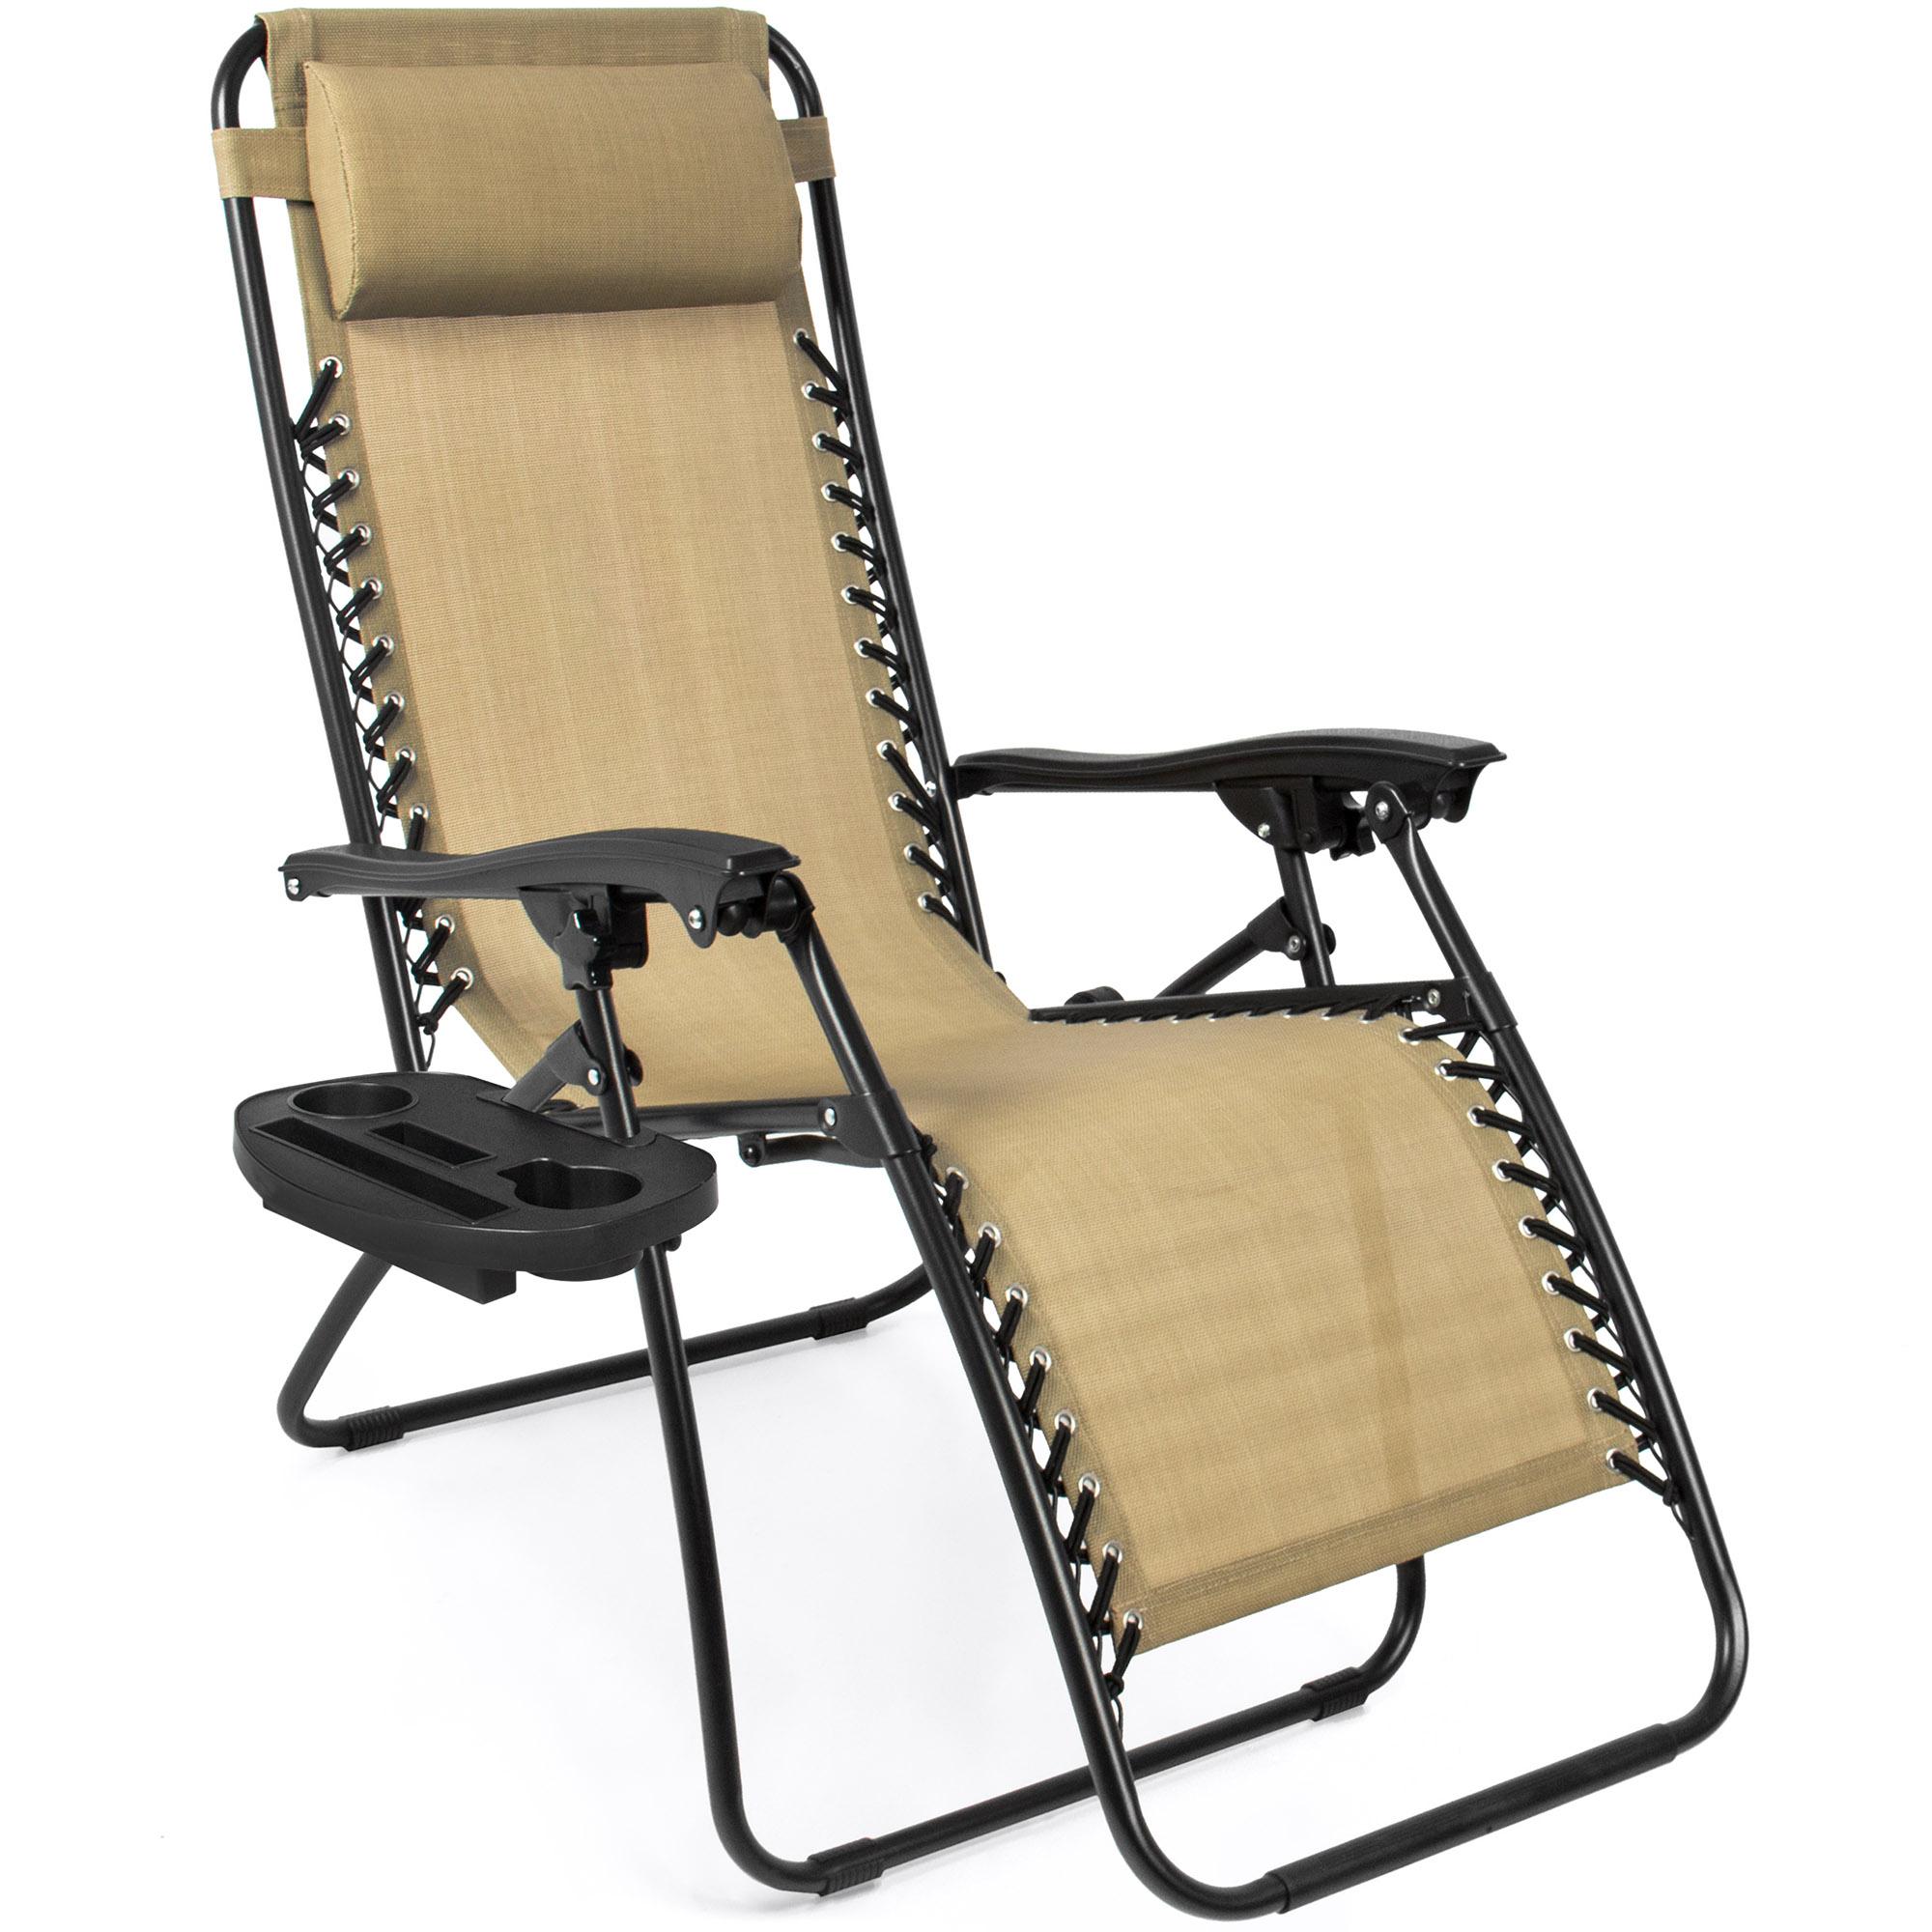 Bcp Set Of 2 Adjustable Zero Gravity Patio Chair Recliners